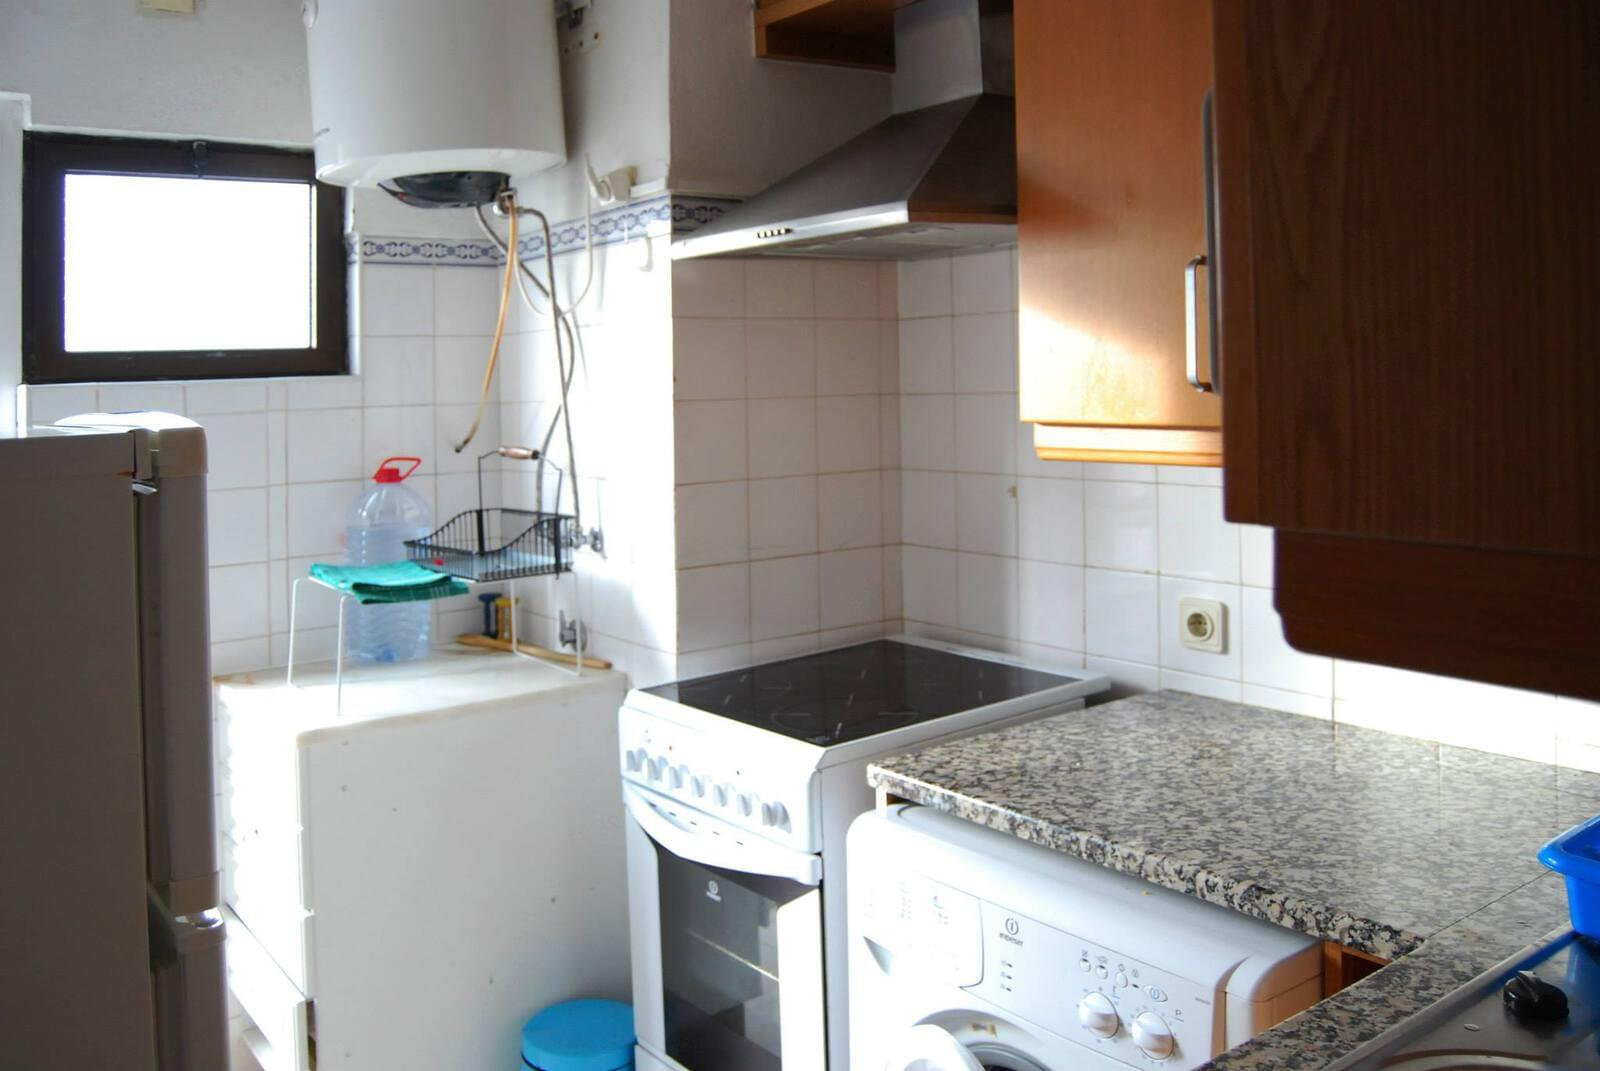 pf17427-apartamento-t1-lisboa-d6e3aeb6-37c0-4007-bae6-77ce0a49d85a